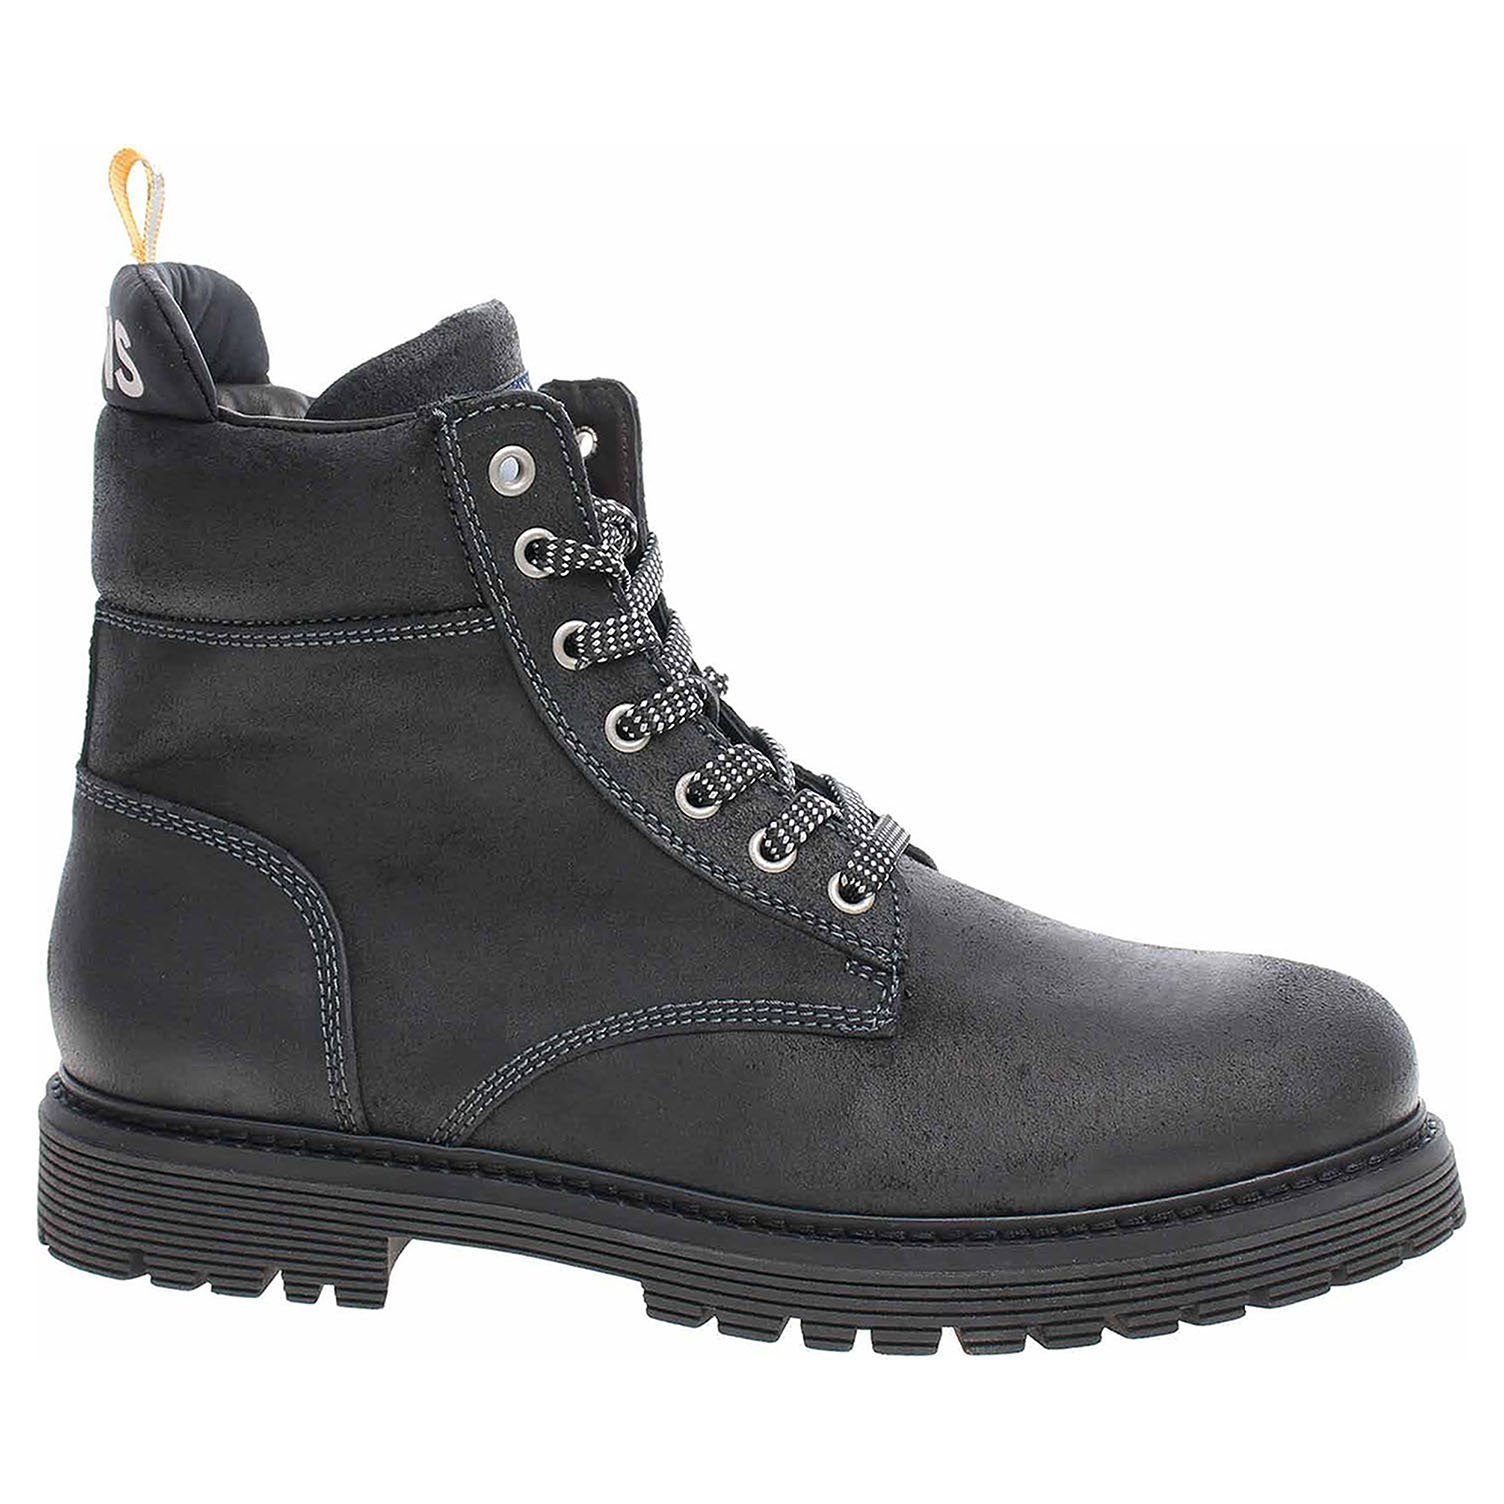 Pánská kotníková obuv Tommy Hilfiger EM0EM00317 008 magnet EM0EM00317 008 43